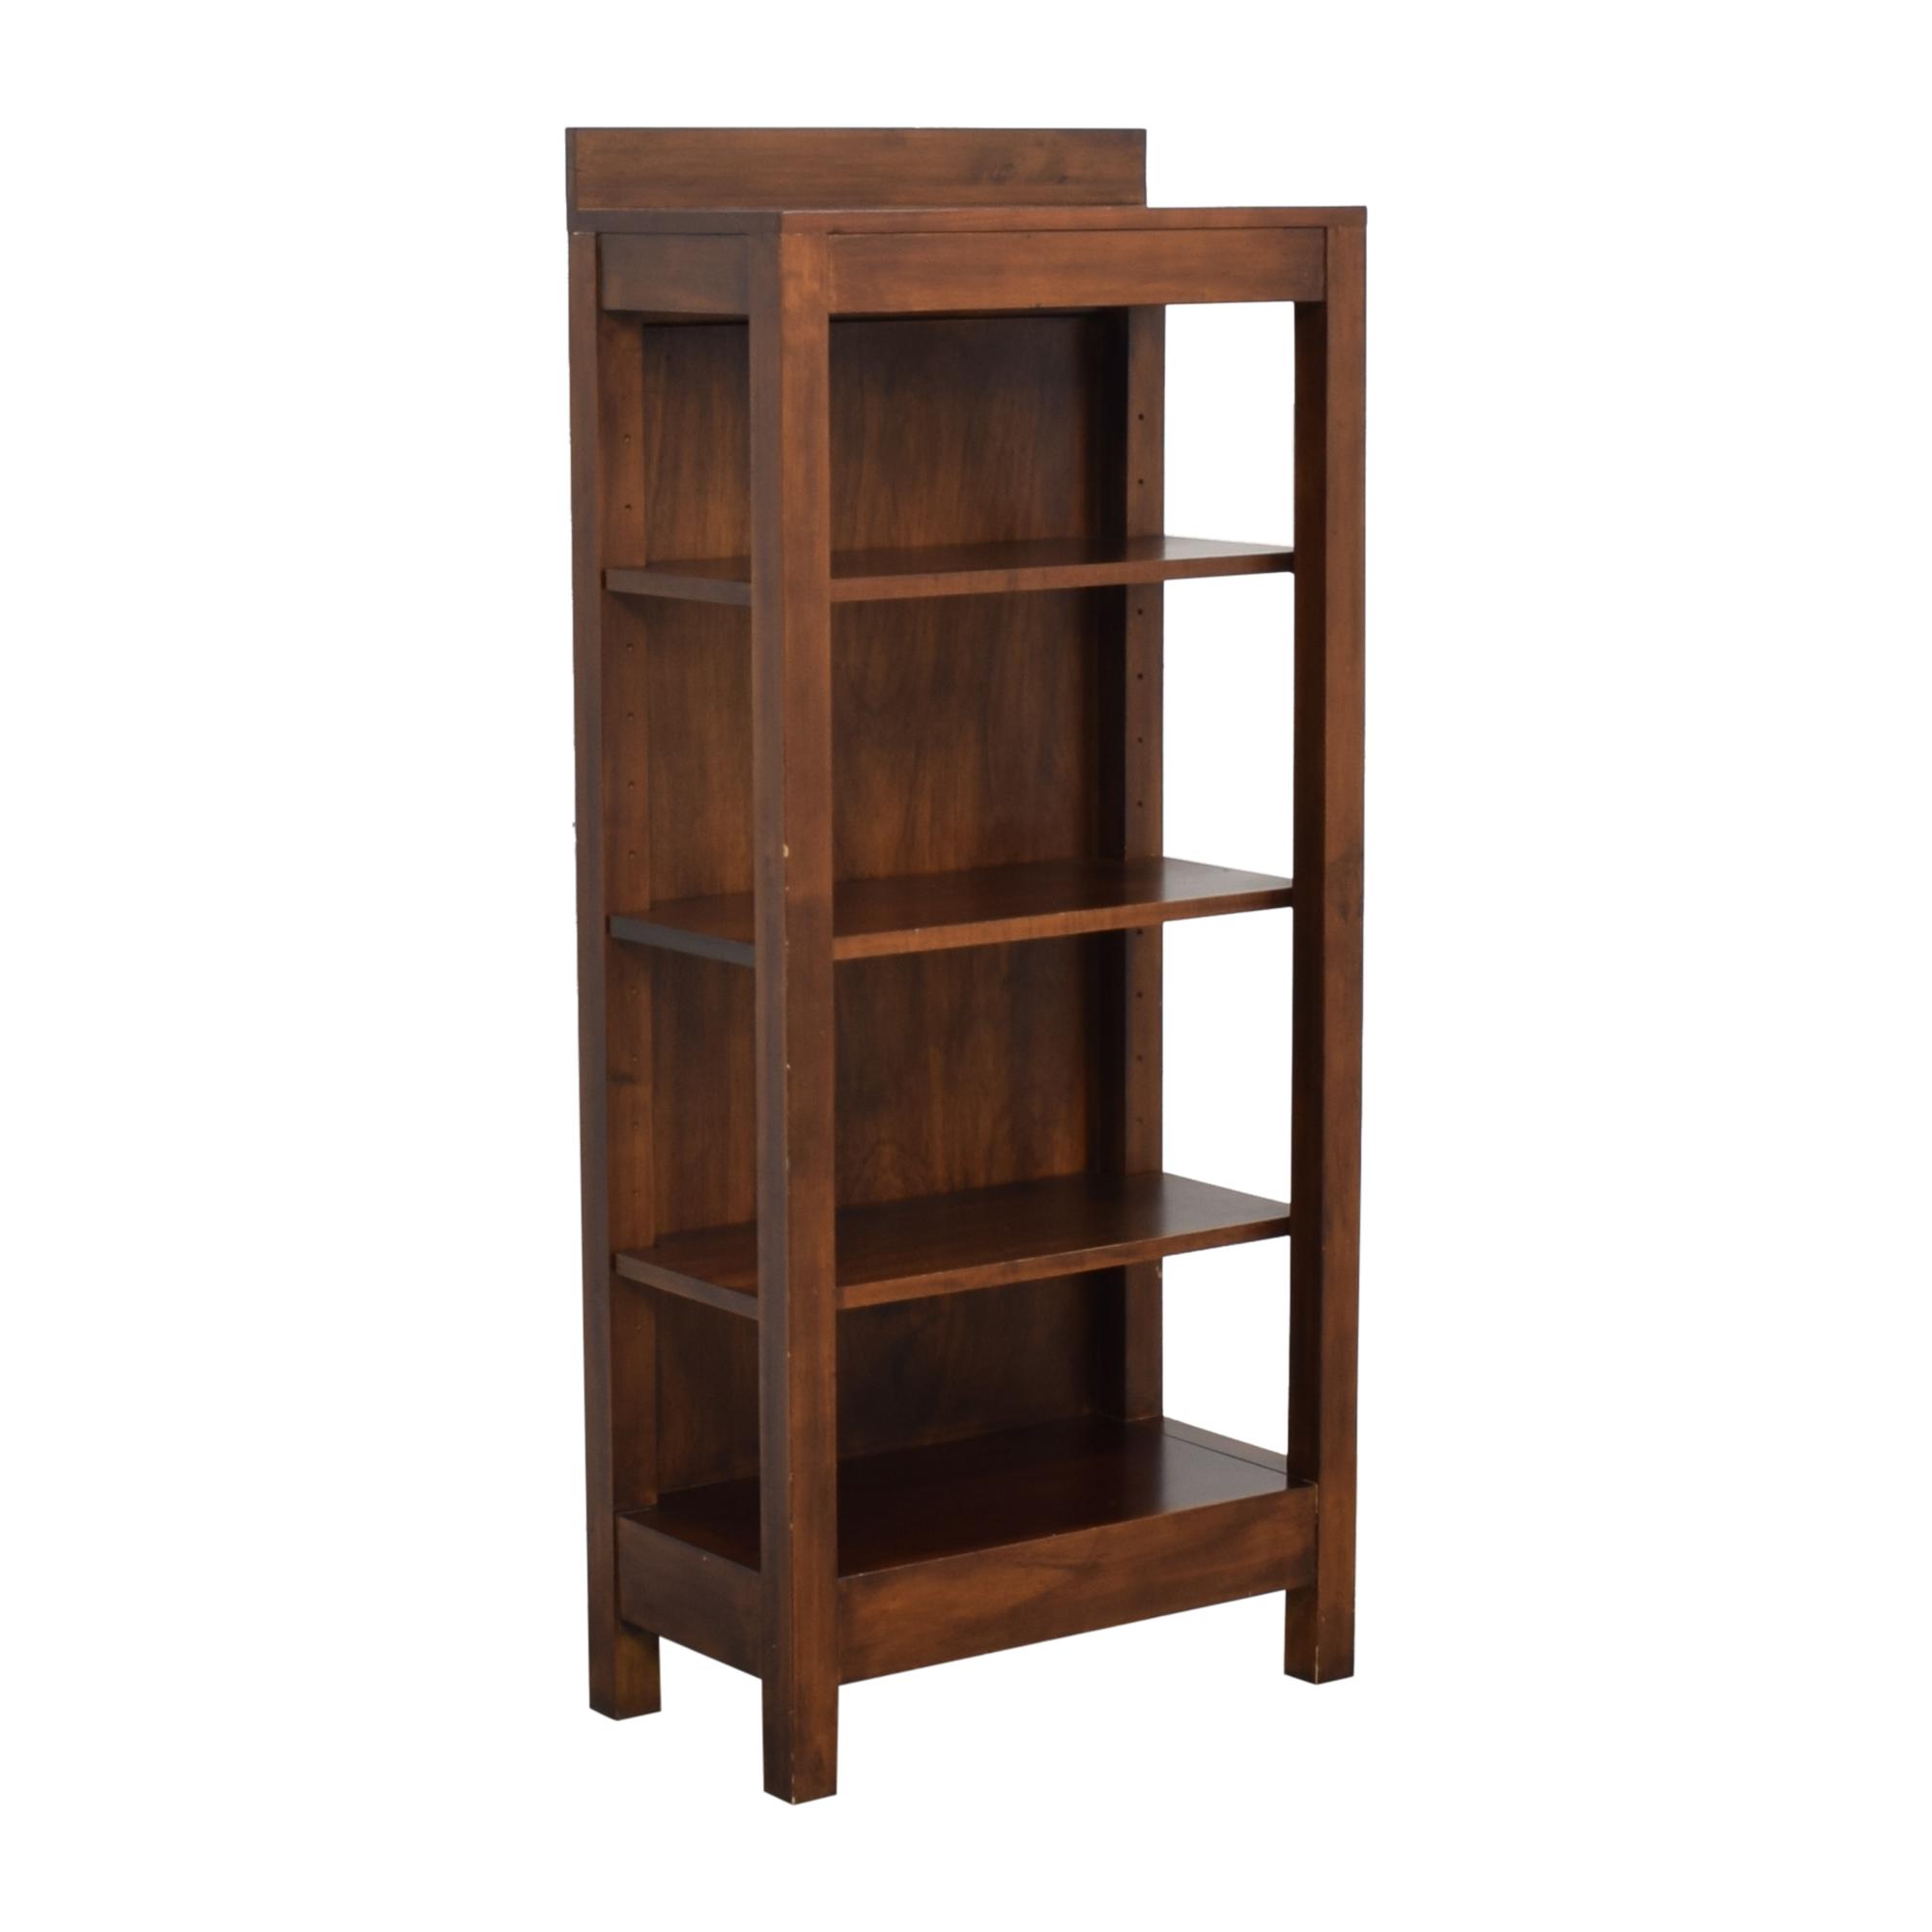 Romweber by Jim Peed Modern Bookcase / Bookcases & Shelving